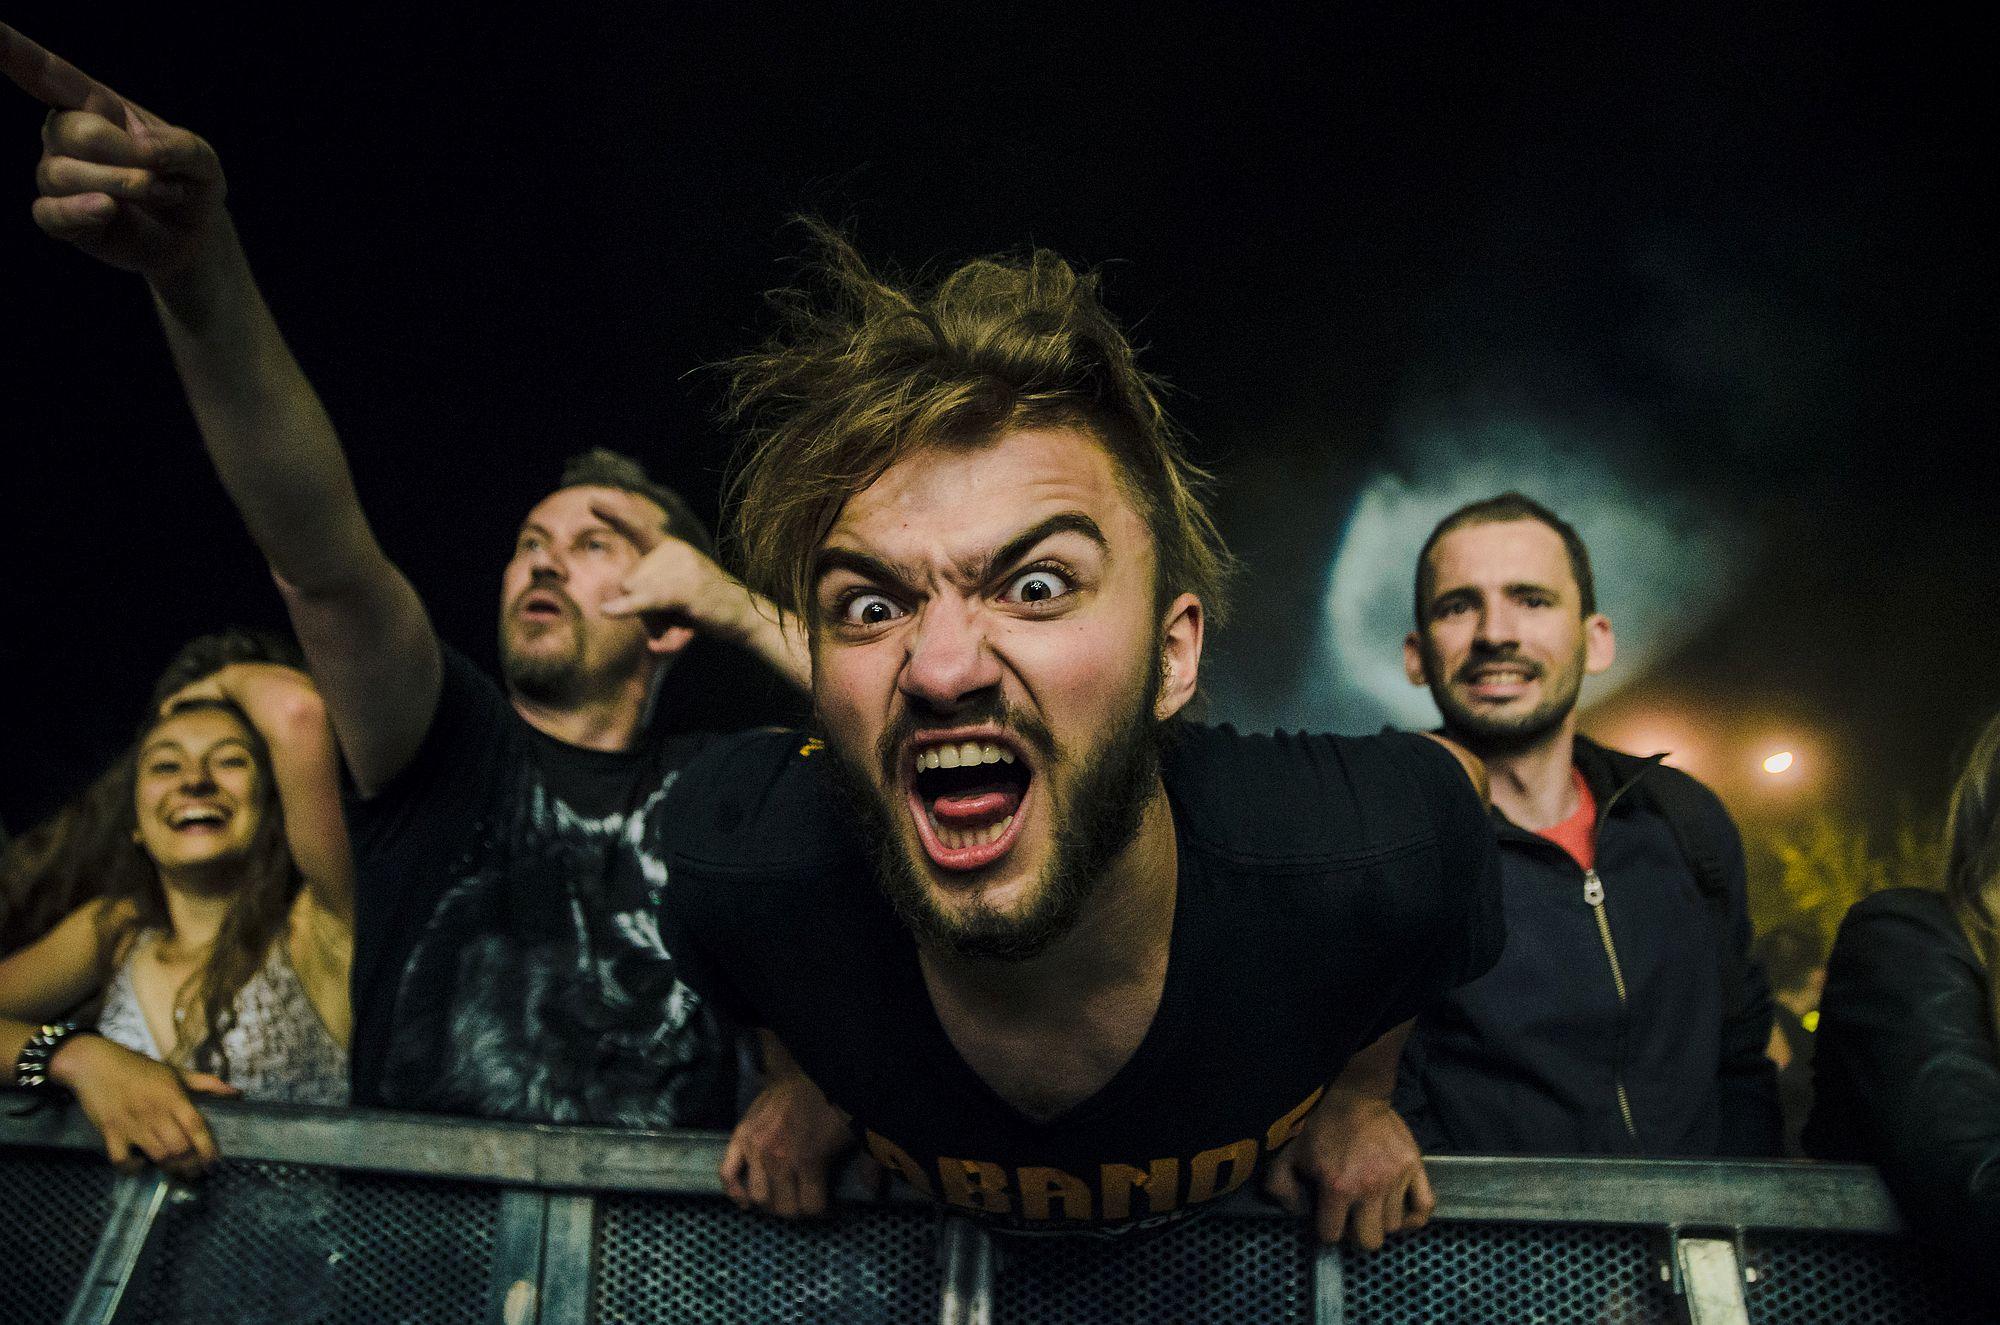 fot. Jakub Bodys (1)